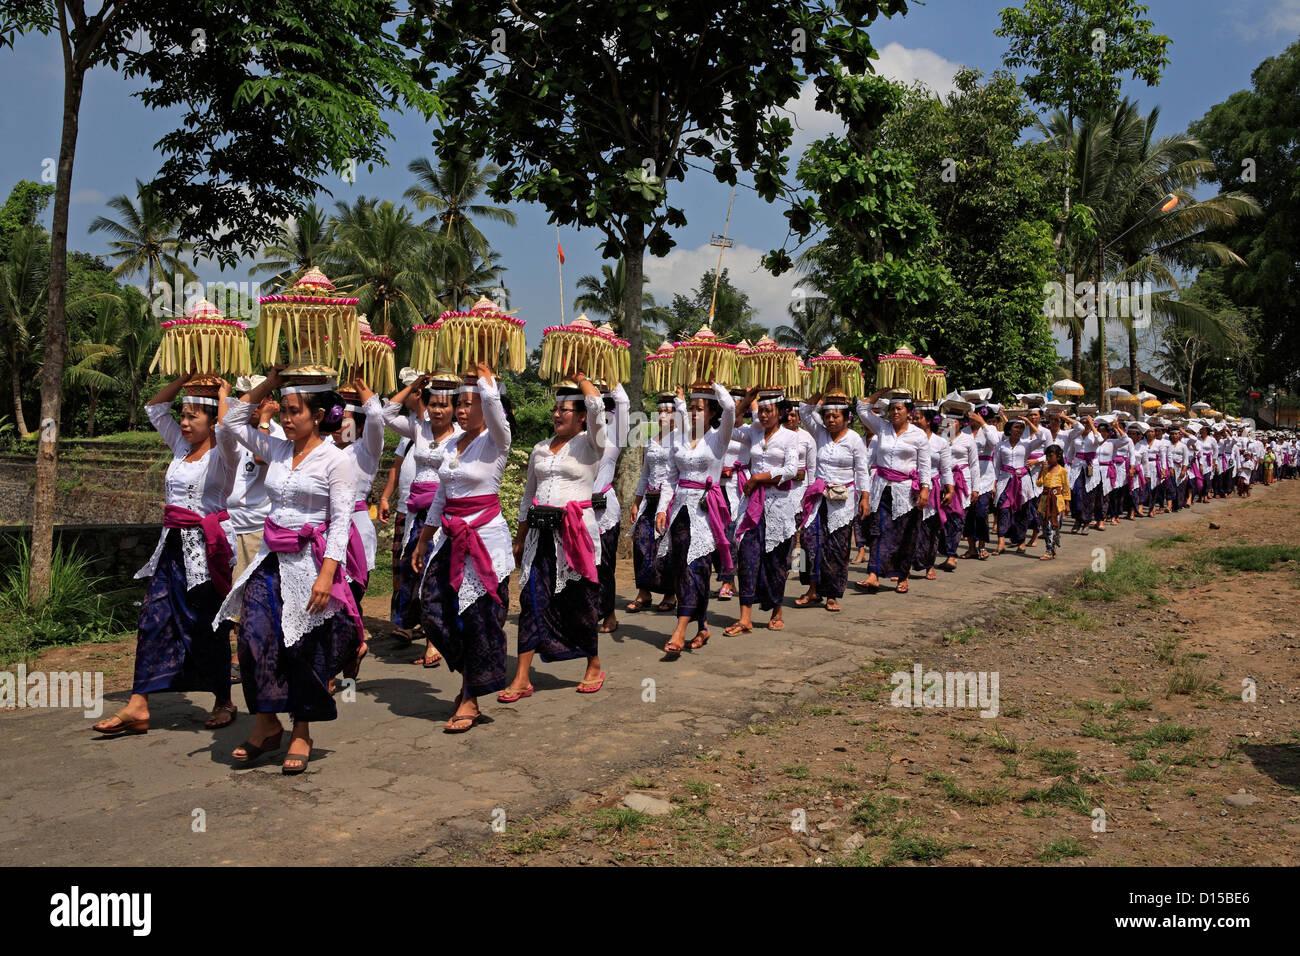 A Hindu temple procession, Pura Dalem Tengaling Temple, near Ubud. Bali, Indonesia - Stock Image